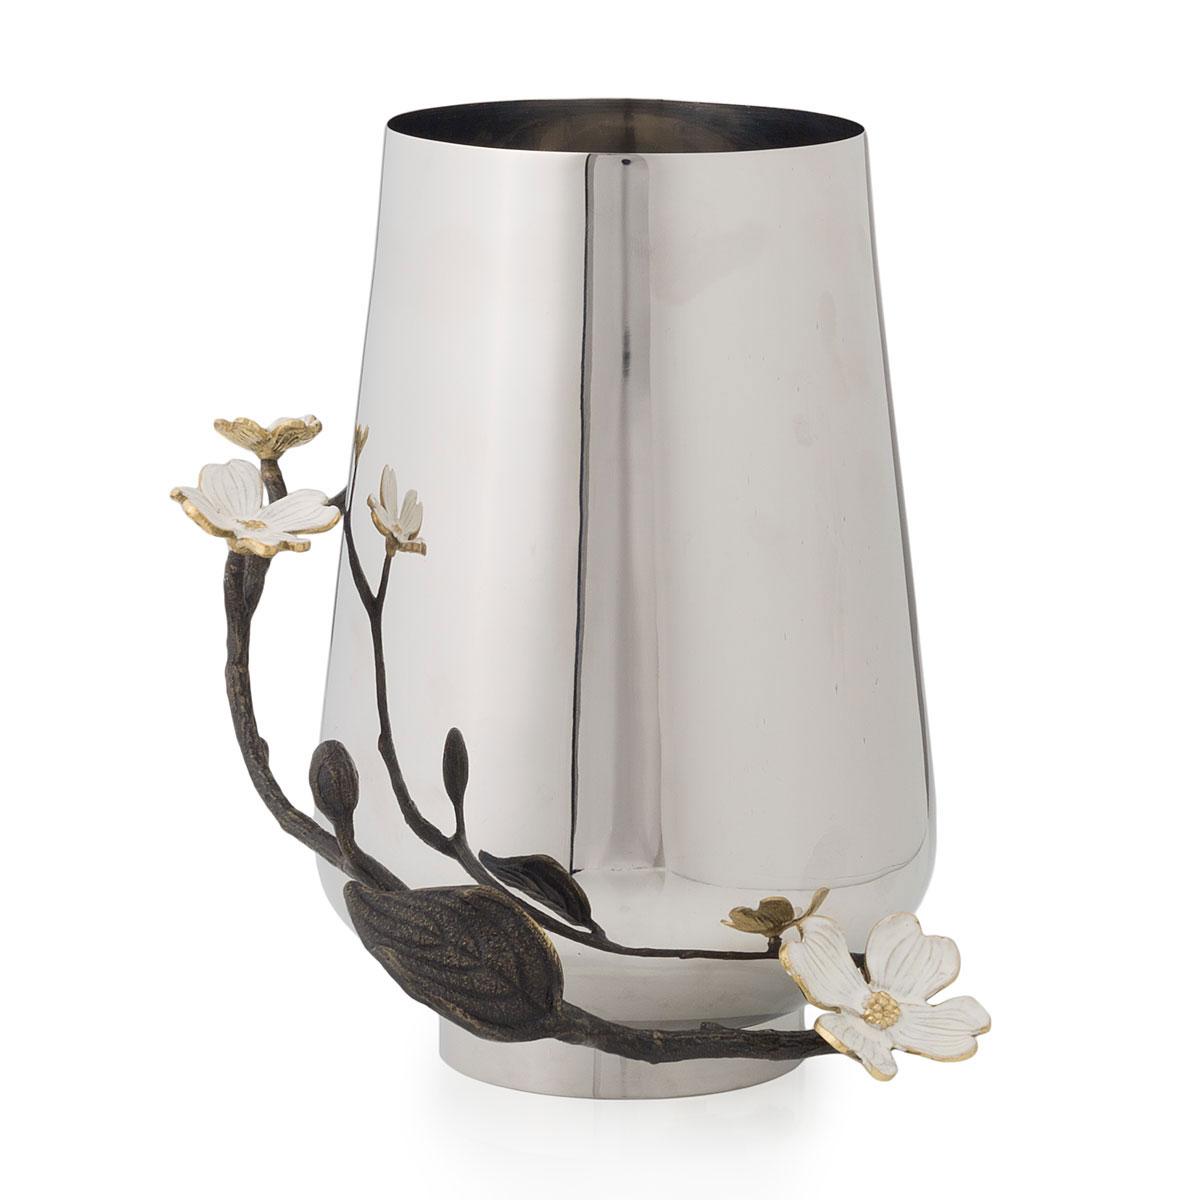 Michael Aram Dogwood Medium Vase